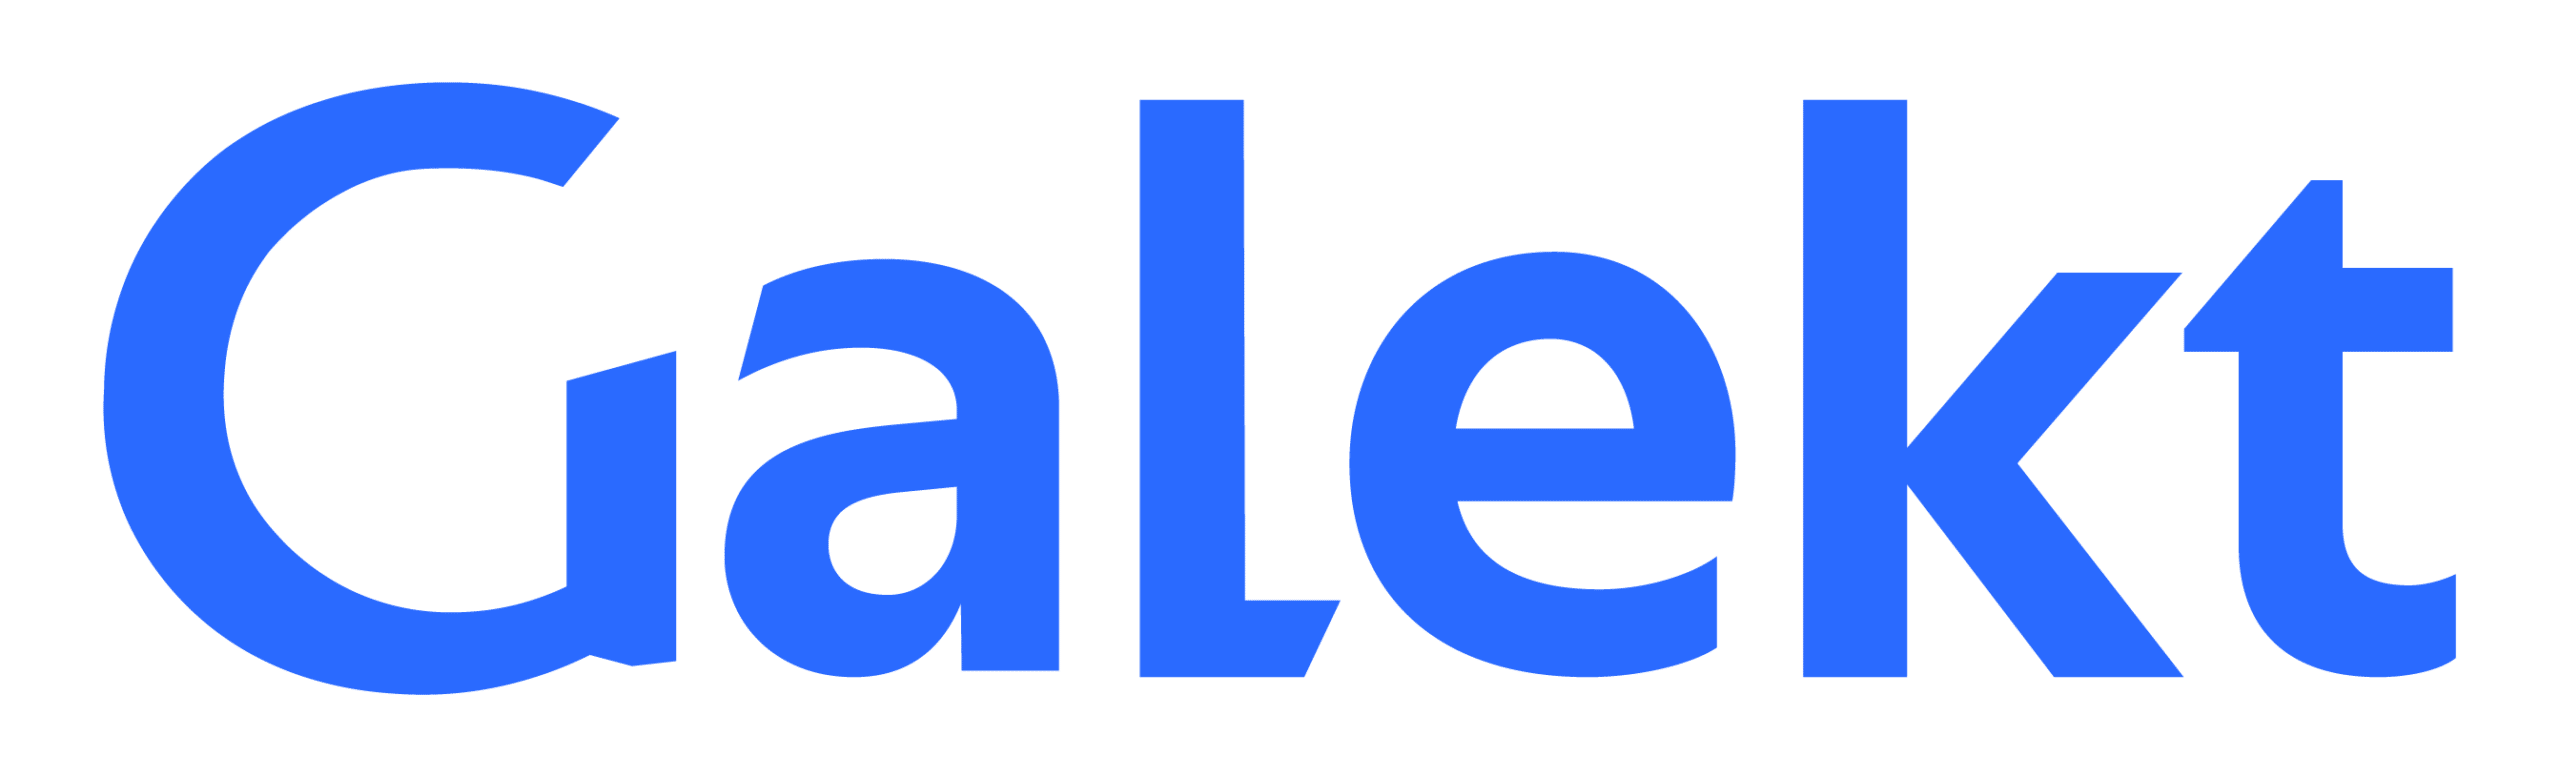 Galekt Logo